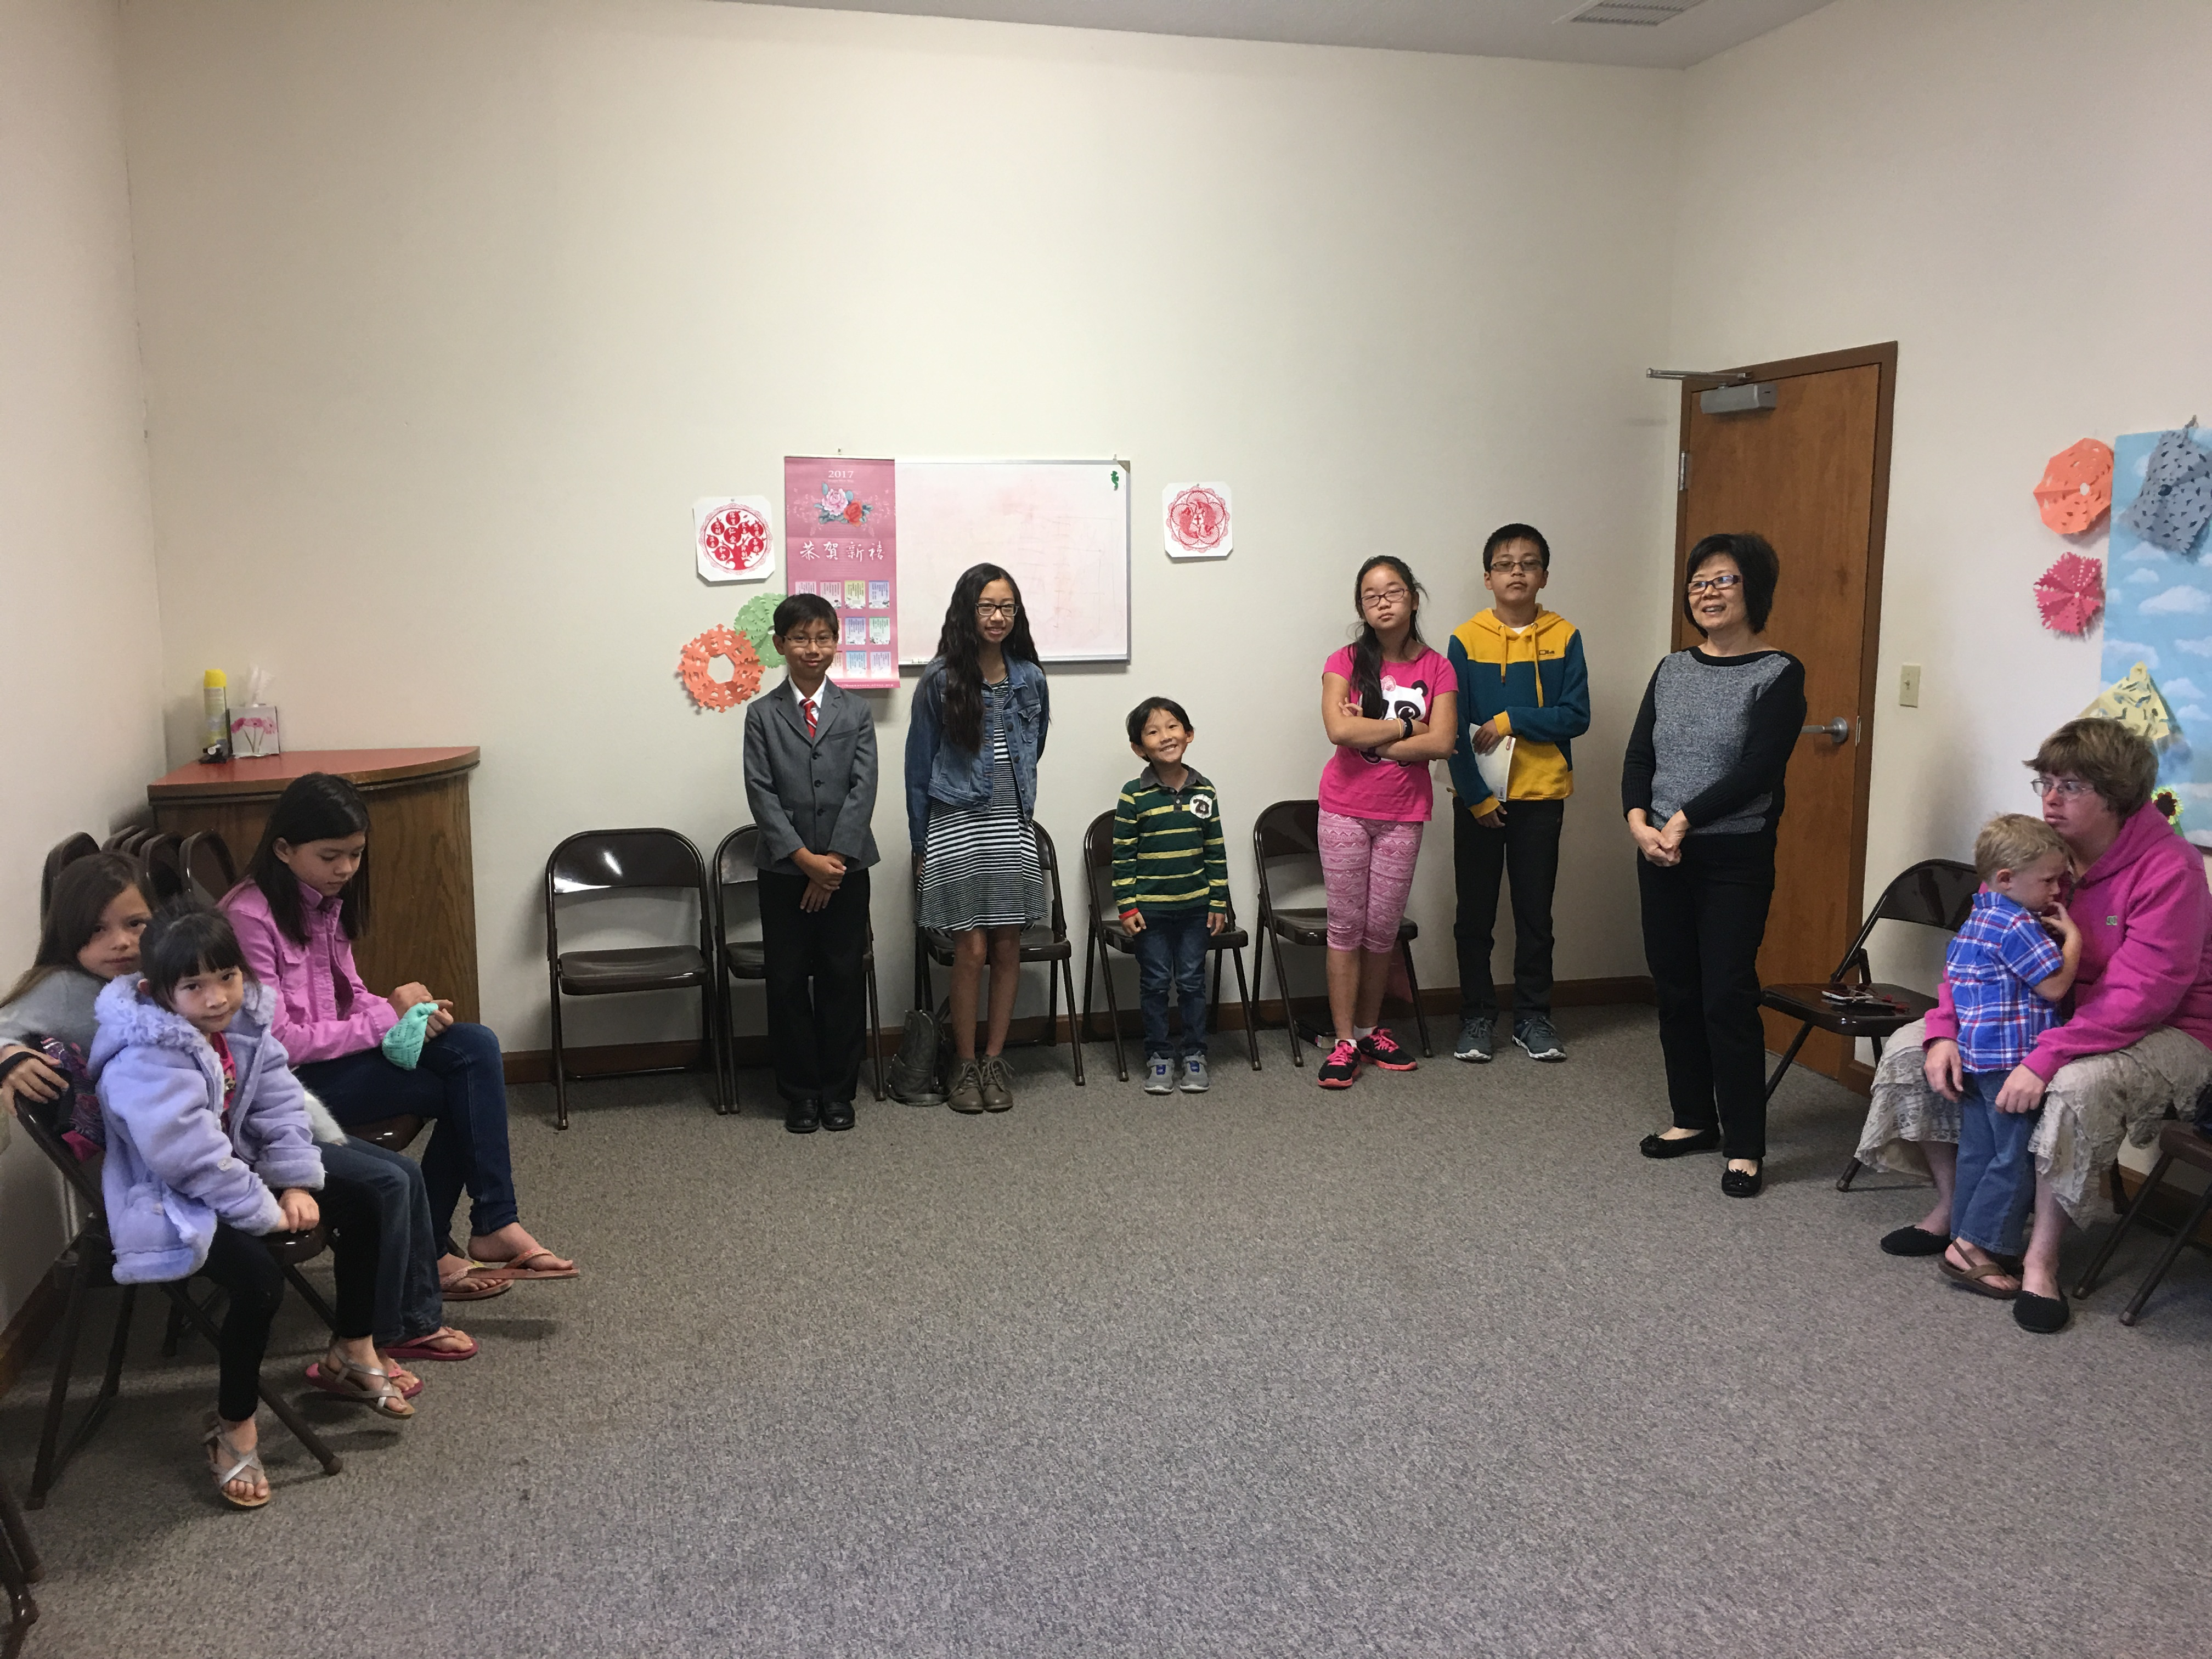 Youth-Children Worship 3-19-17